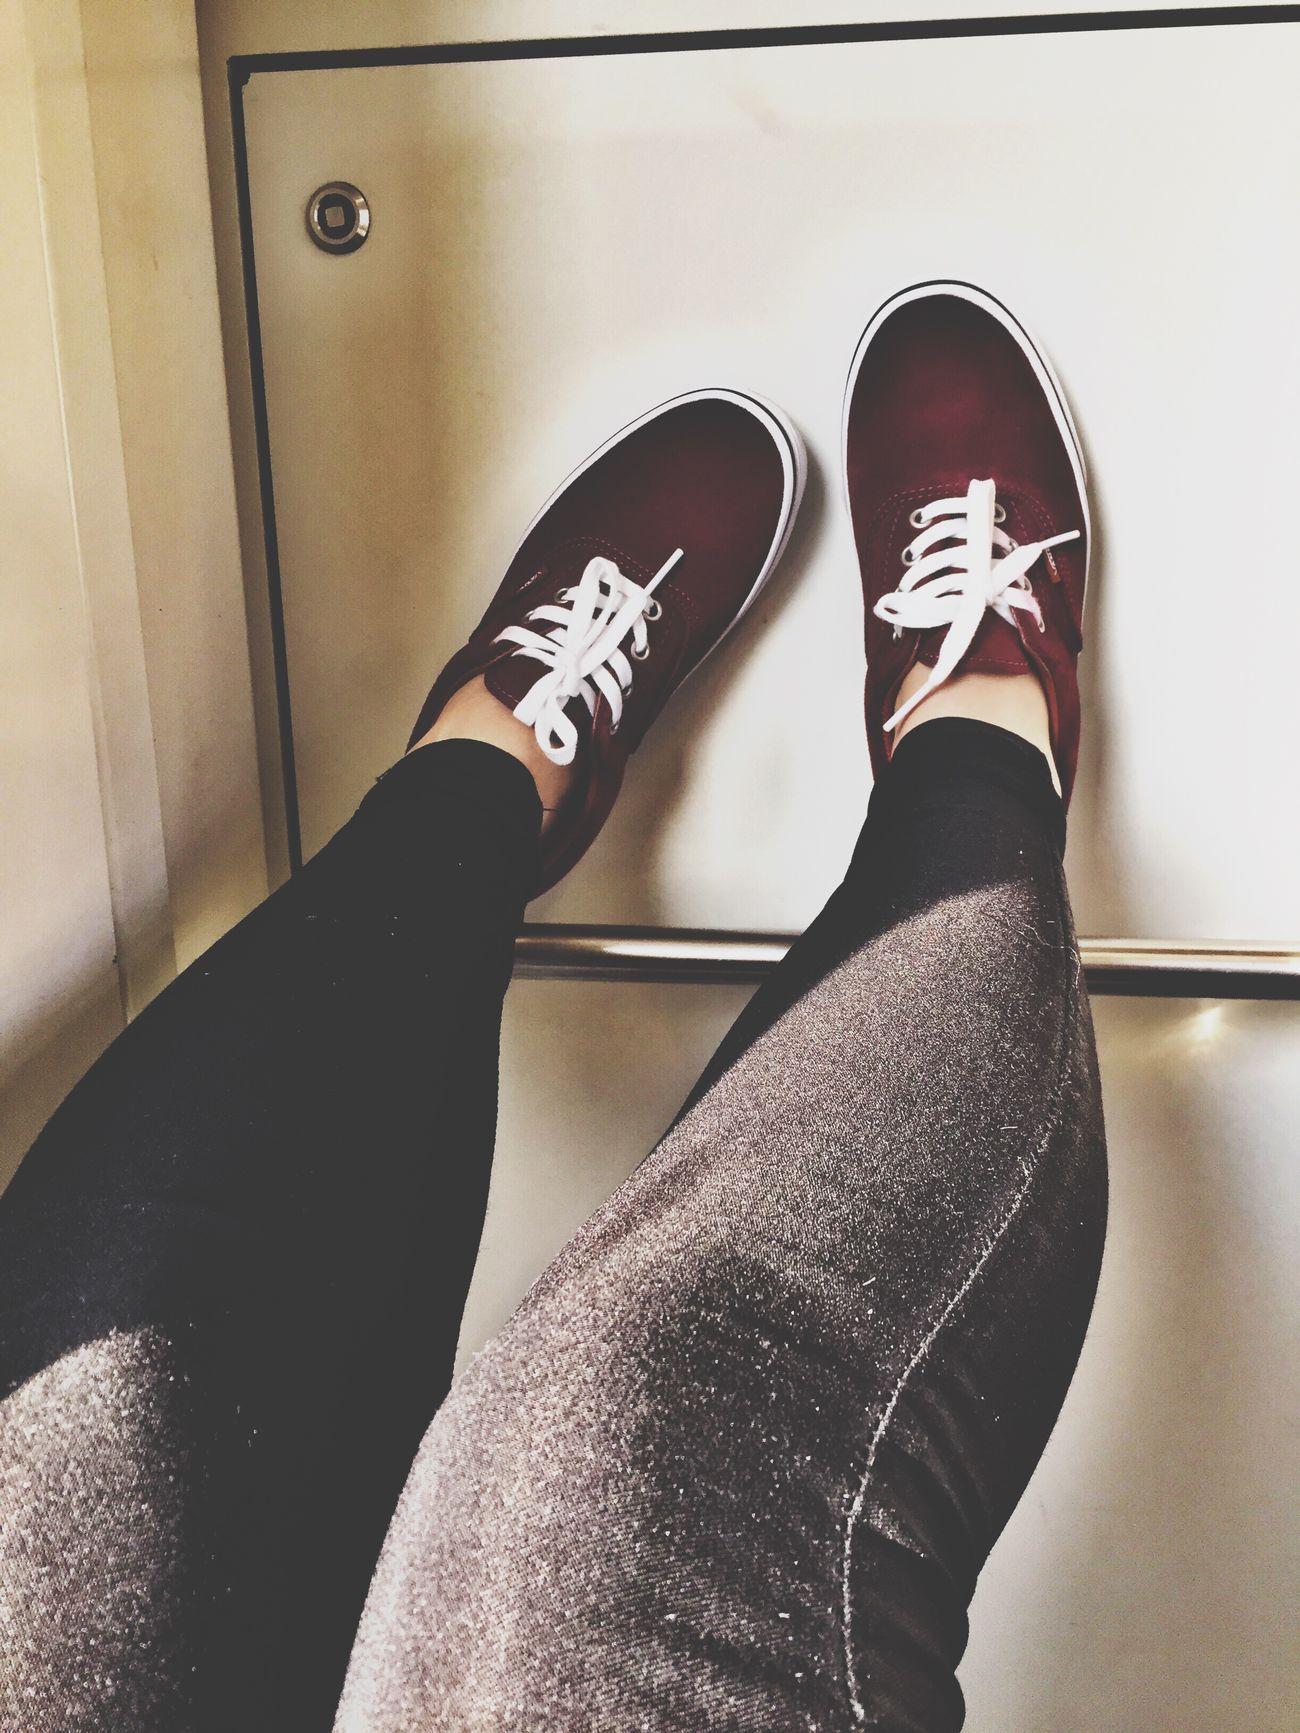 Meine Leben. Vans Vans #swag Swag Amô LebePerfect Love Pretty Girl Amazing